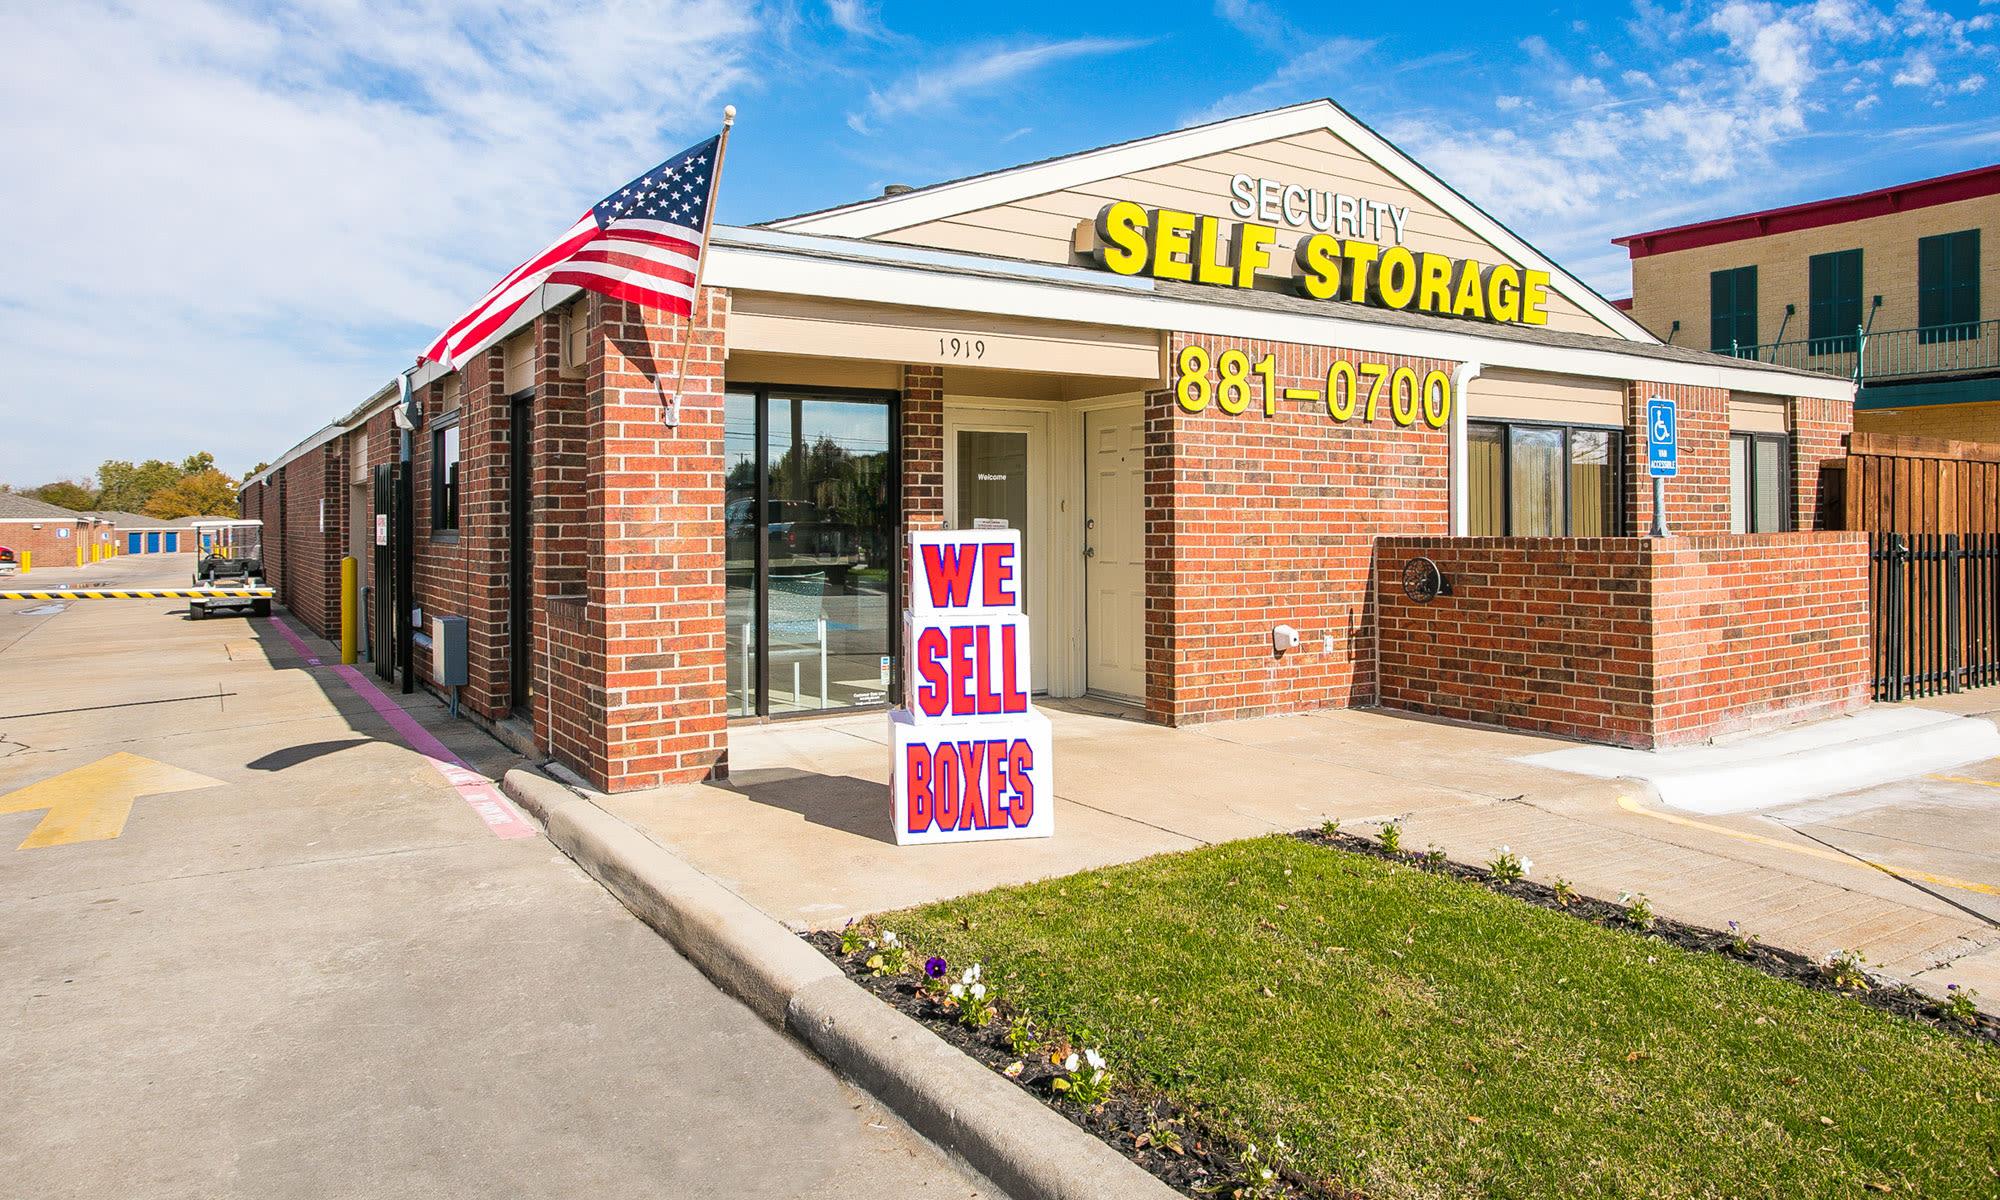 Self storage in Plano TX